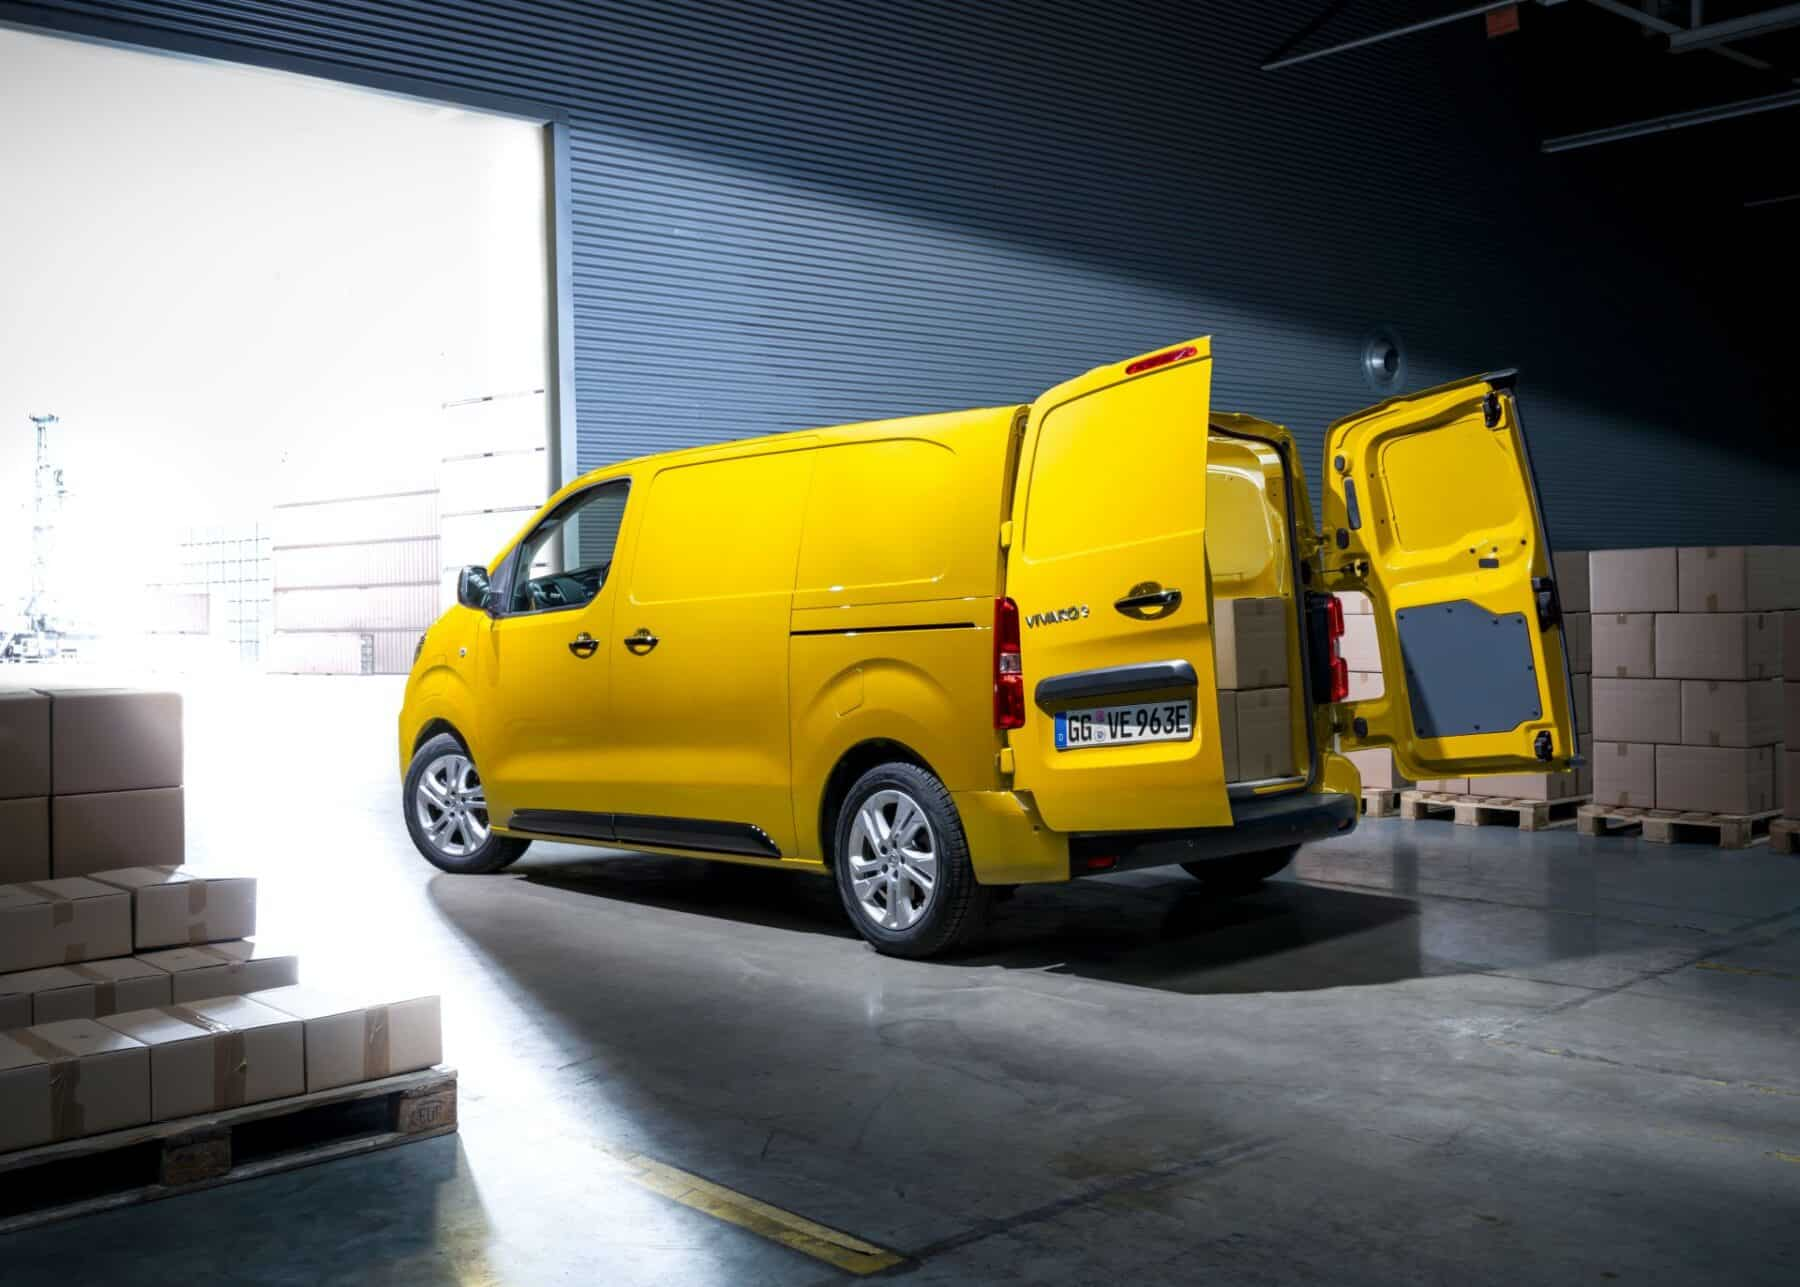 2021 Opel Vivaro Price and Release date